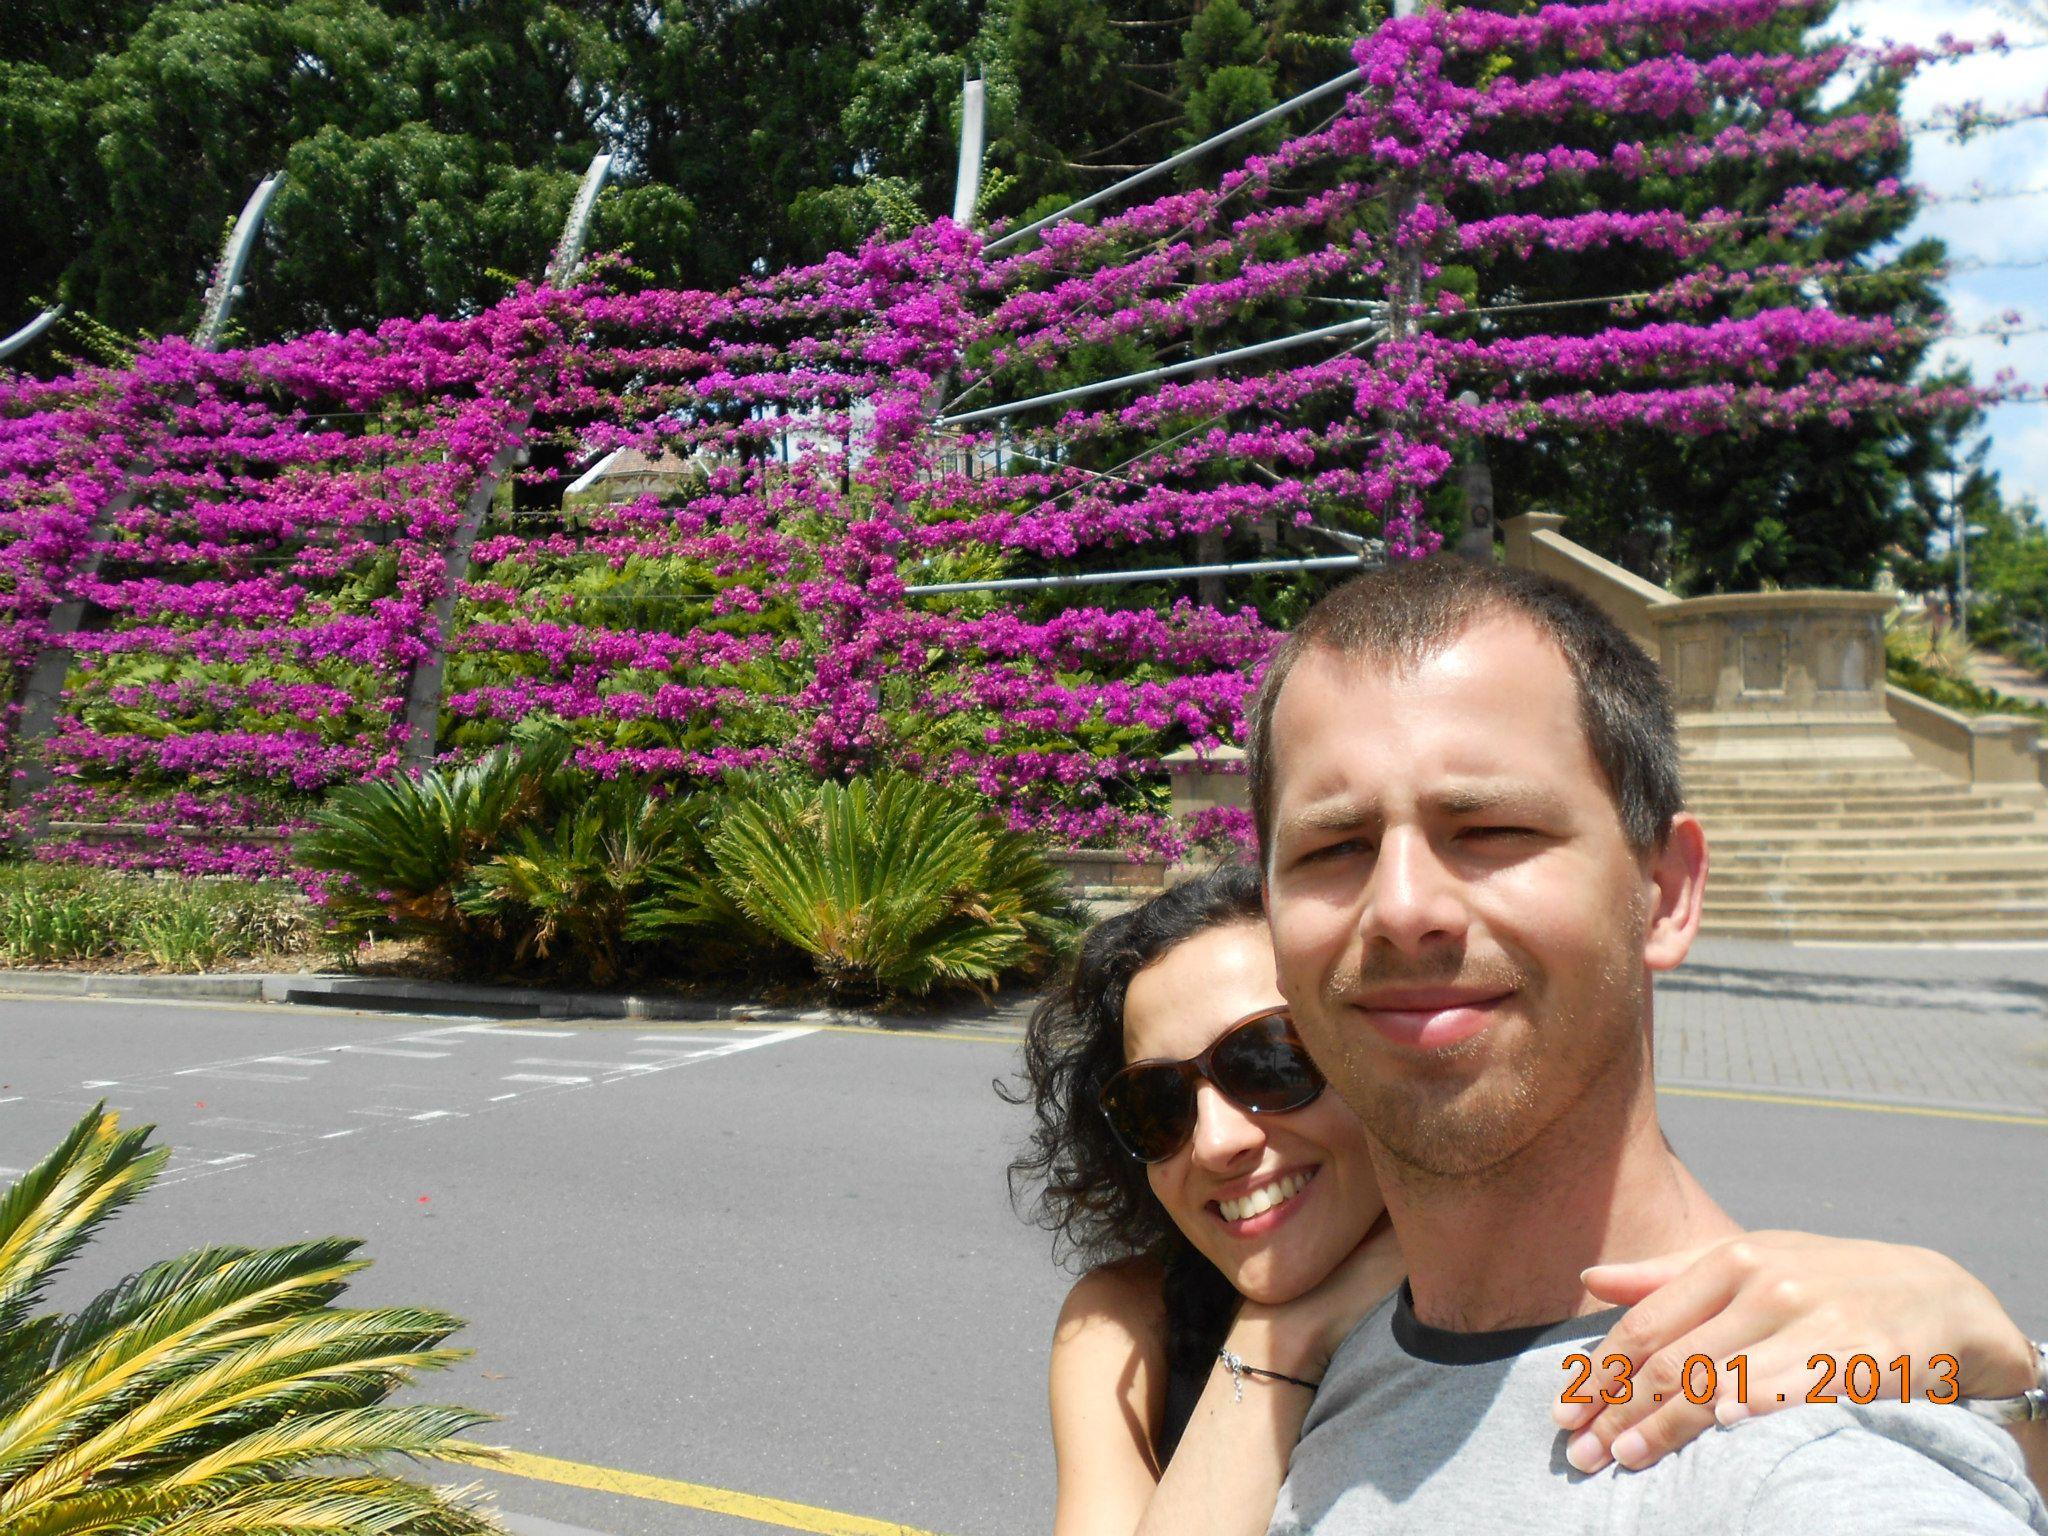 Ola i Adam w Australii